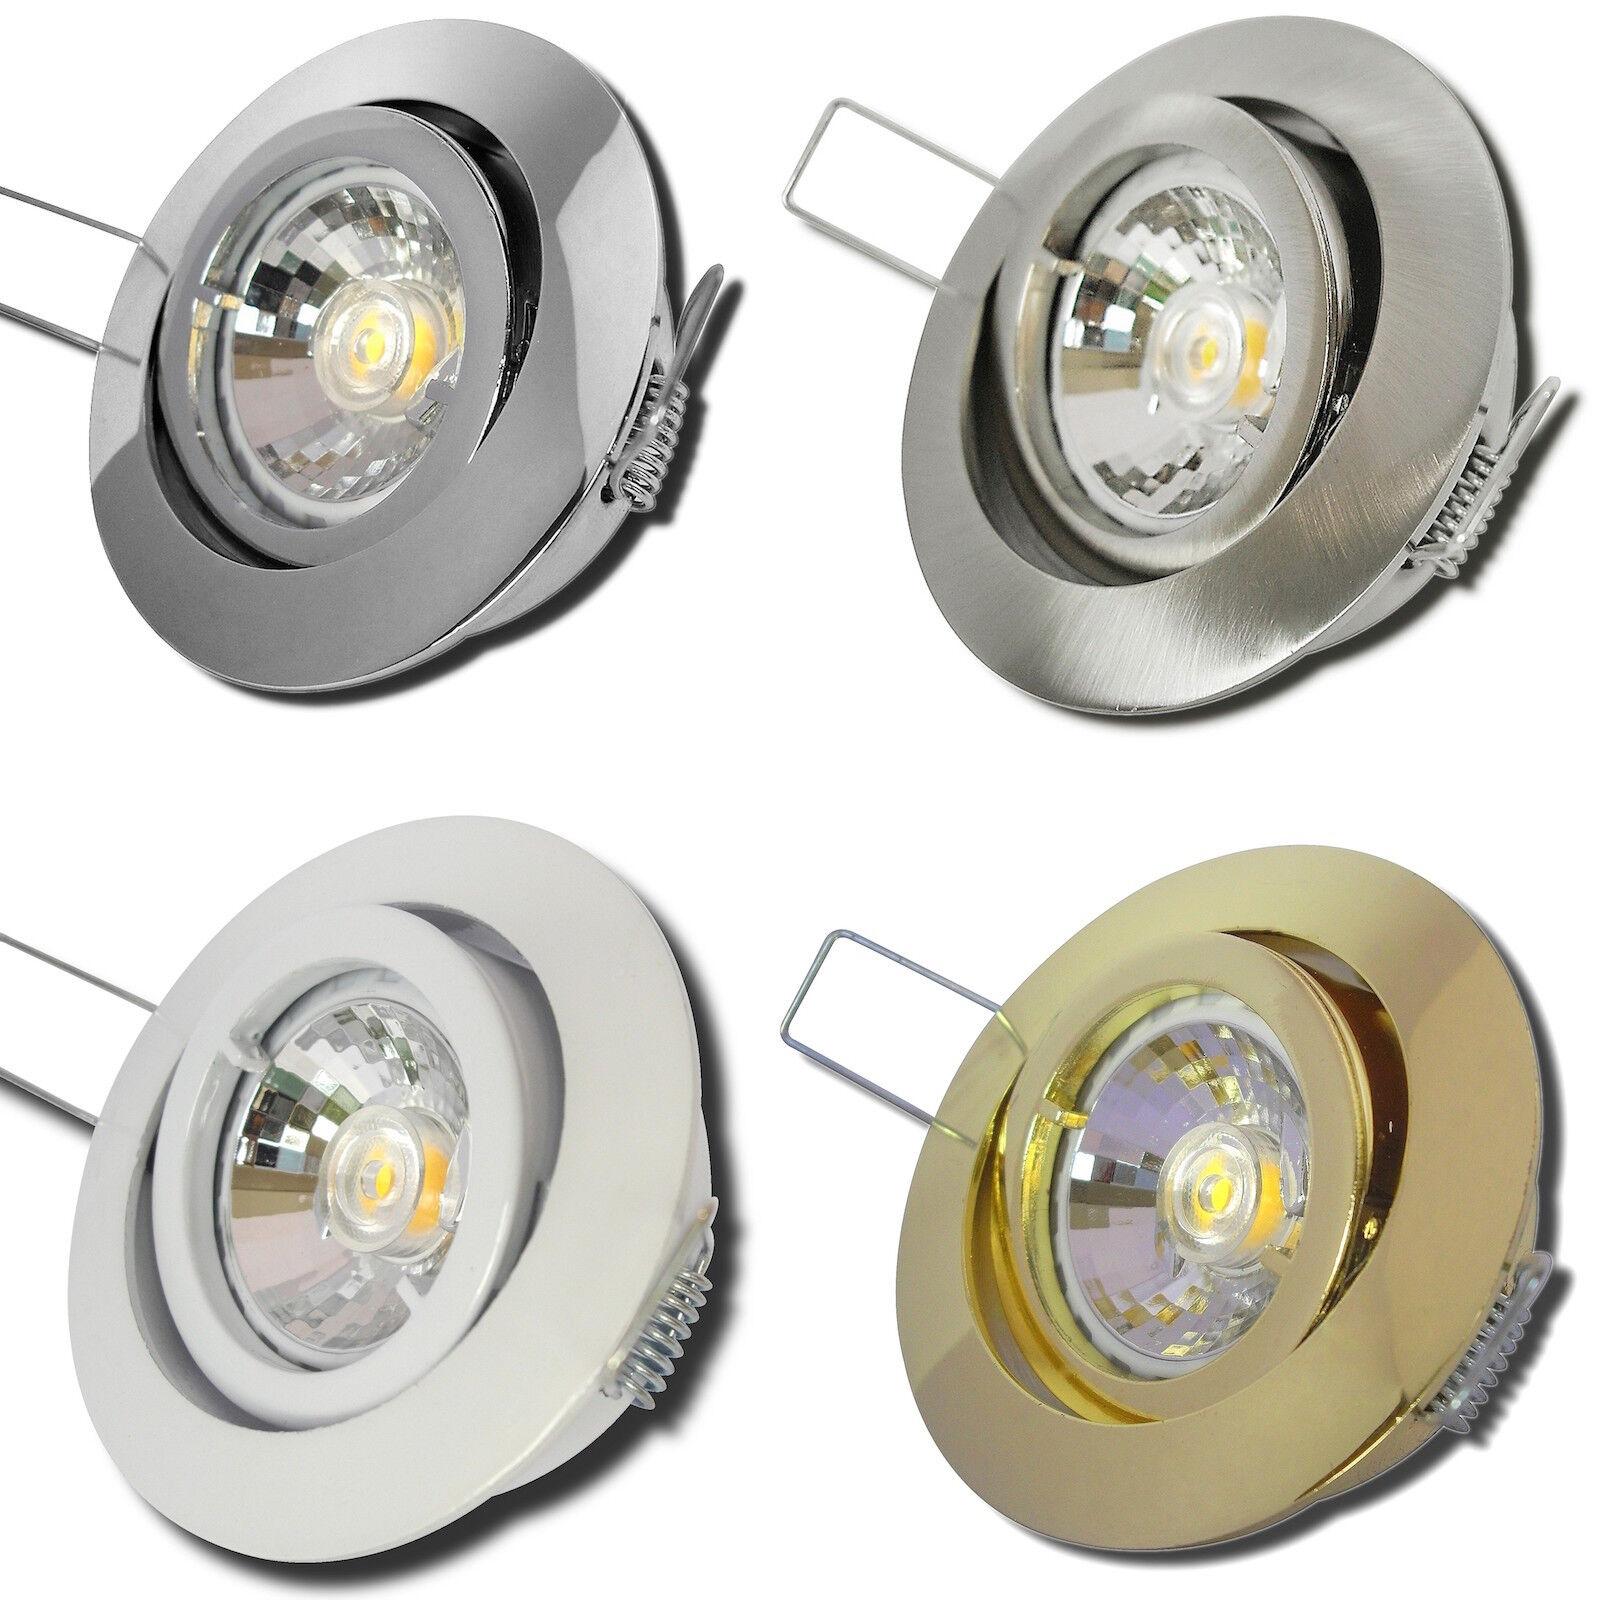 Einbauspot Tino   220Volt   Gu10   LED LM COB   5W   Reflektor   Rostfrei   IP20